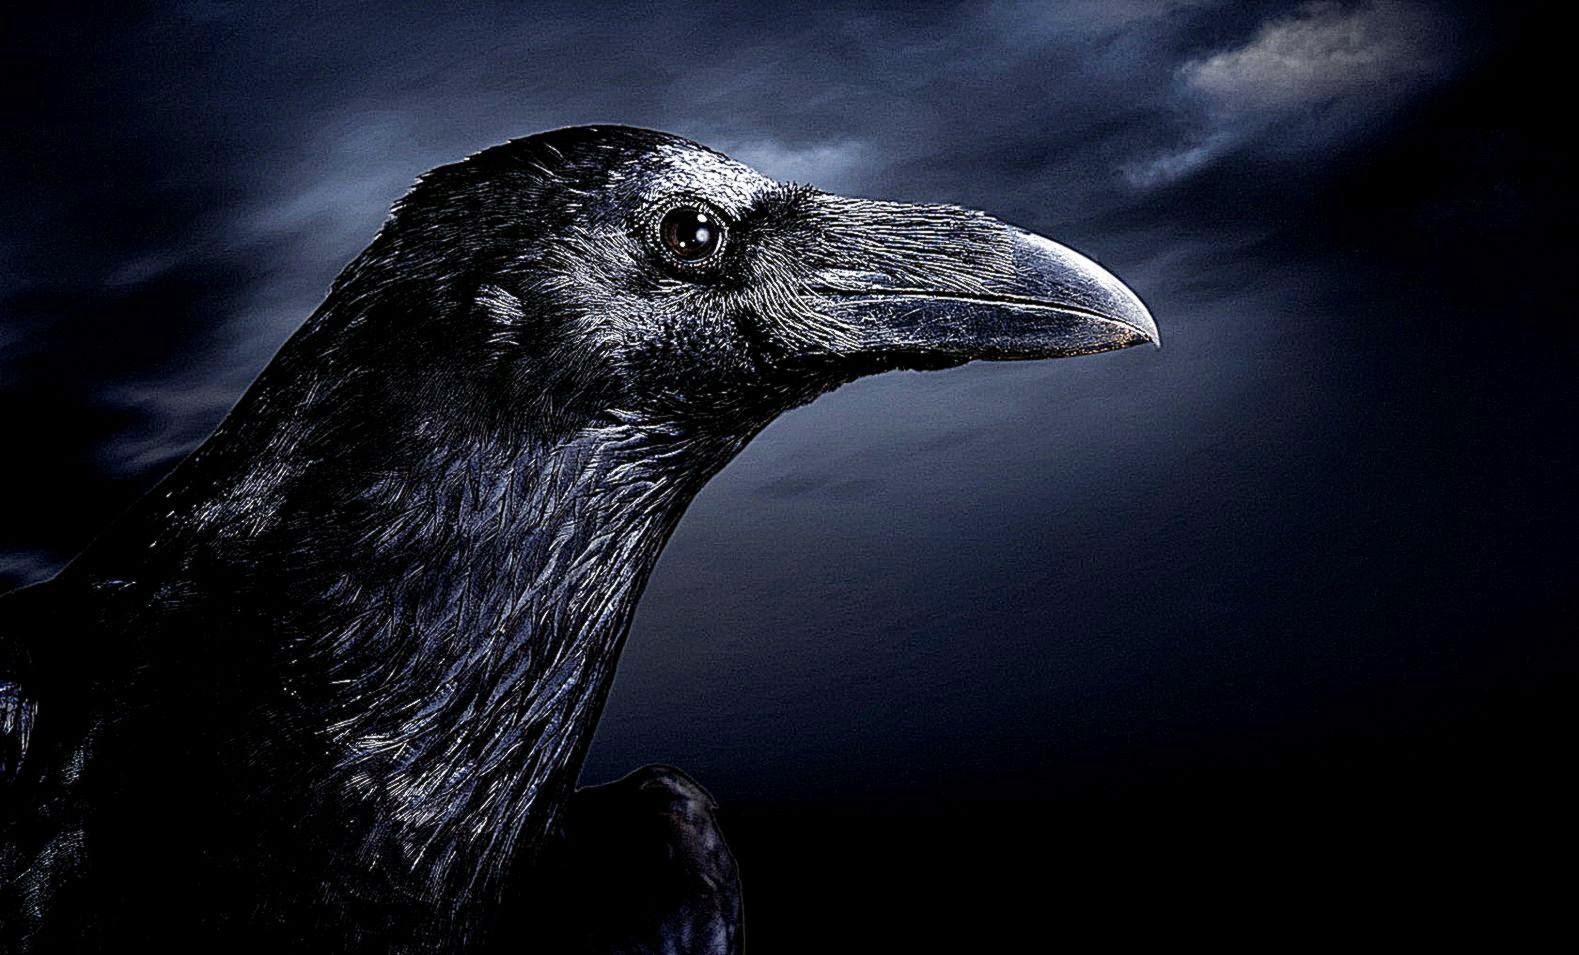 Dark Raven Wallpapers Wallpapers Records 1579x955